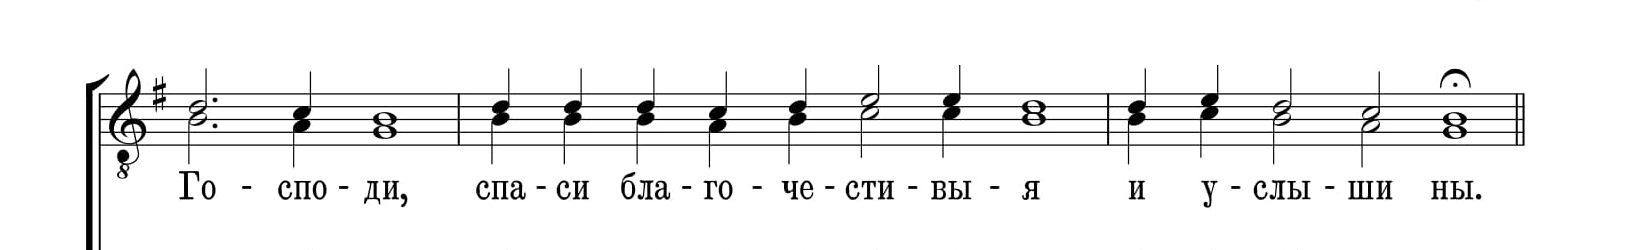 Трисвятое (Матфей)